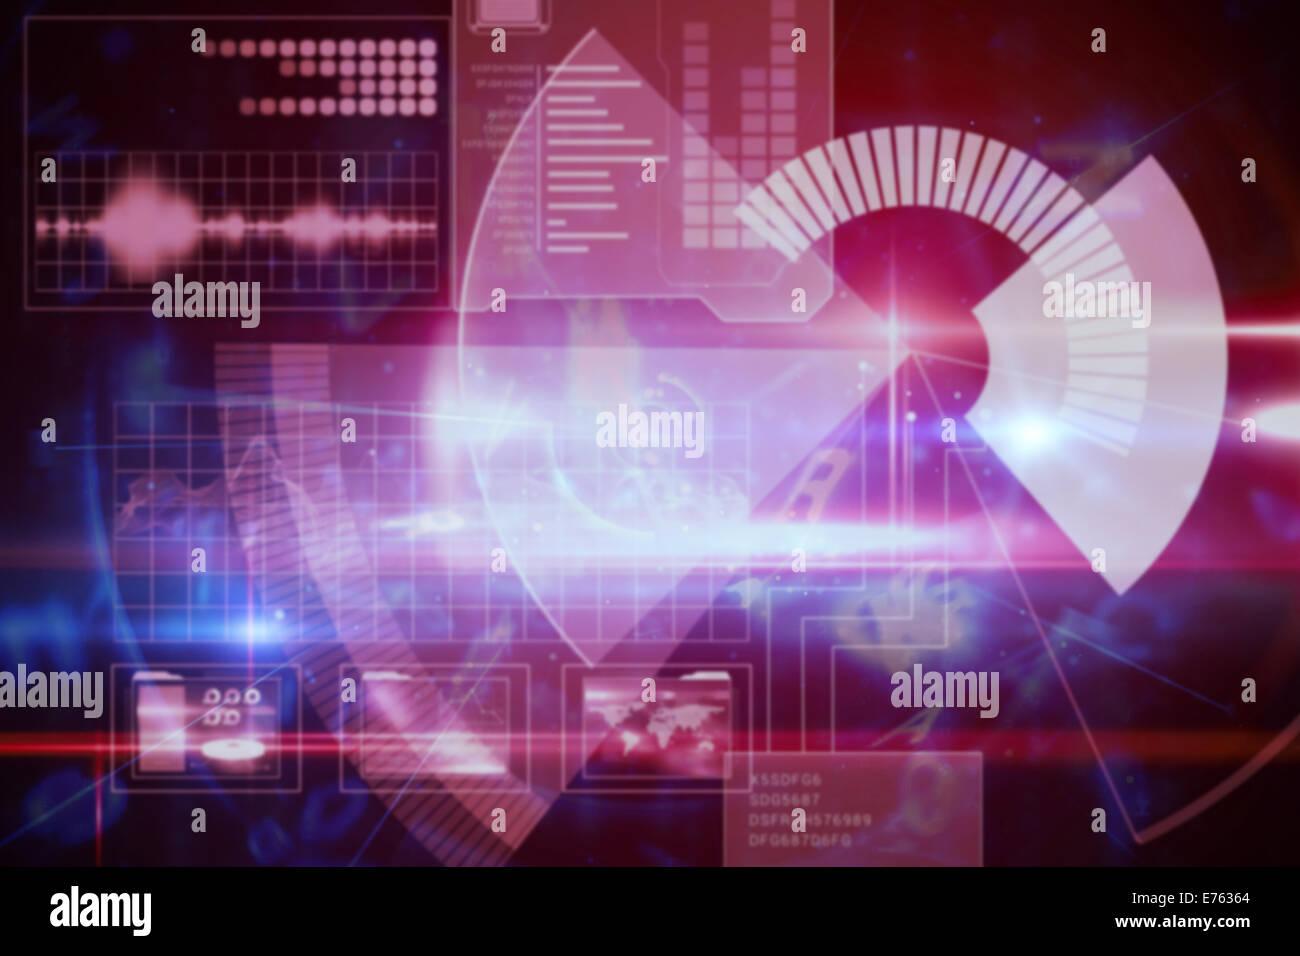 Digital technology interface - Stock Image